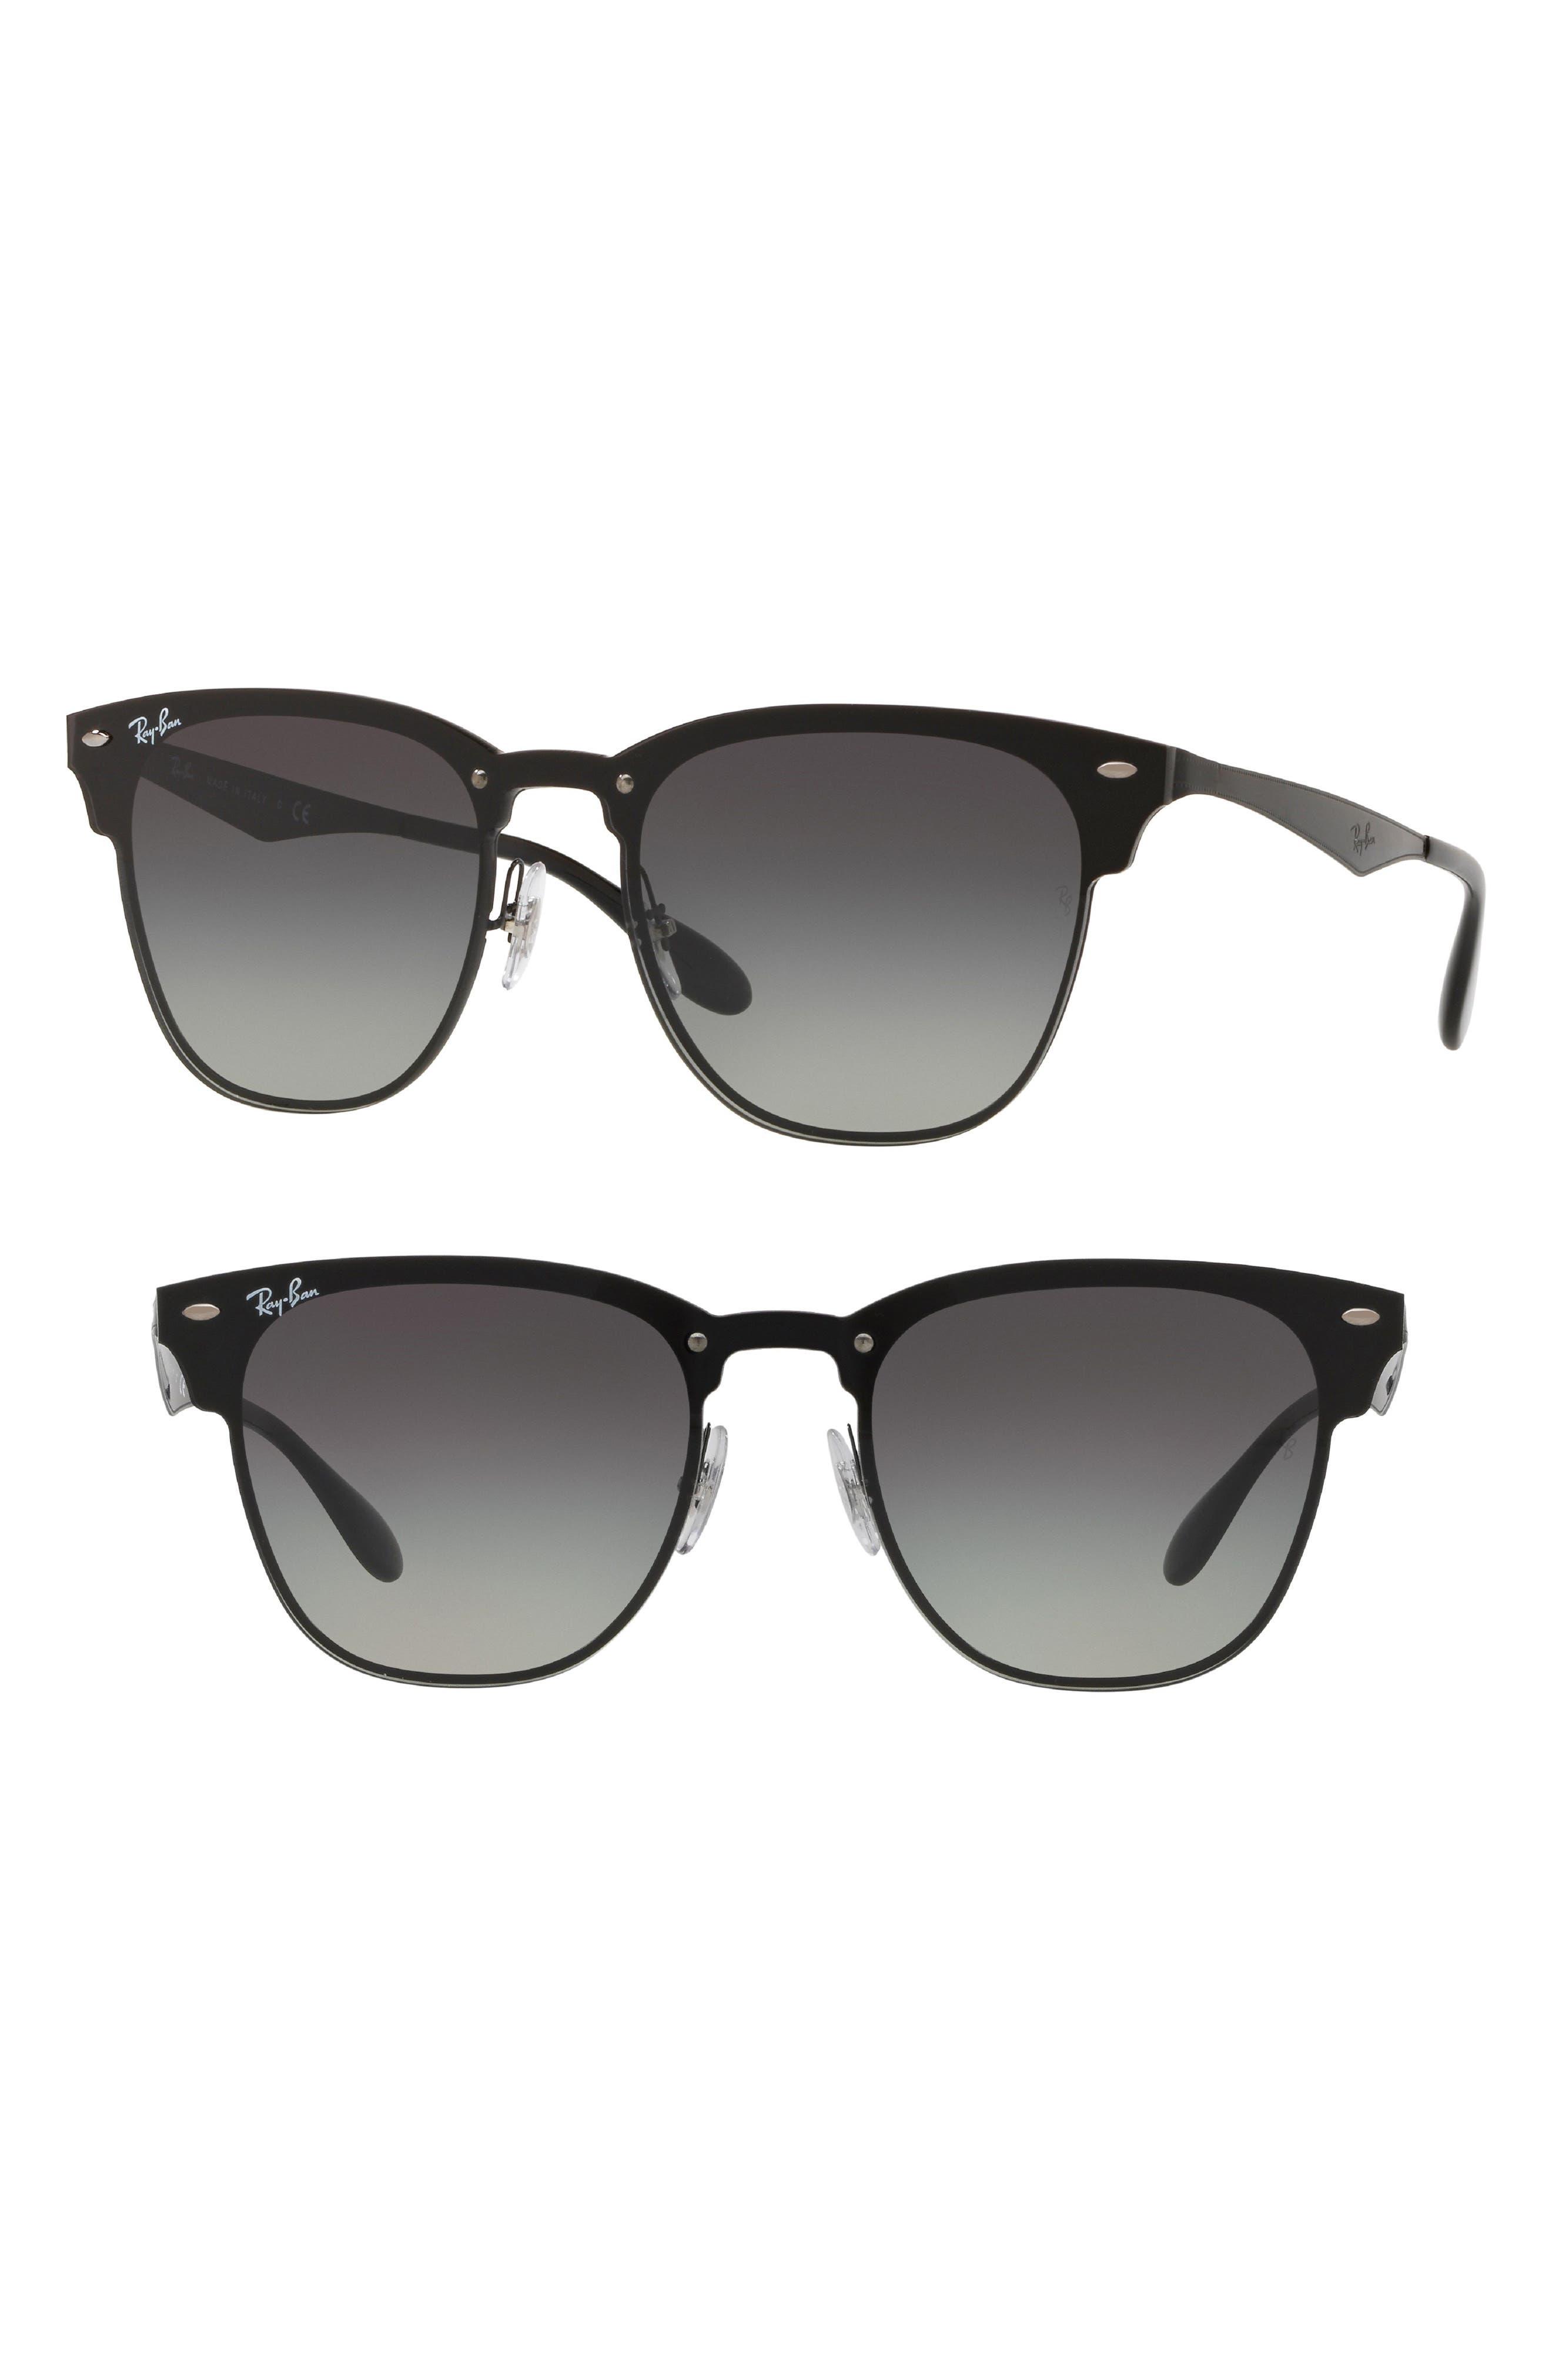 Ray-Ban Blaze Clubmaster 50Mm Sunglasses - Black